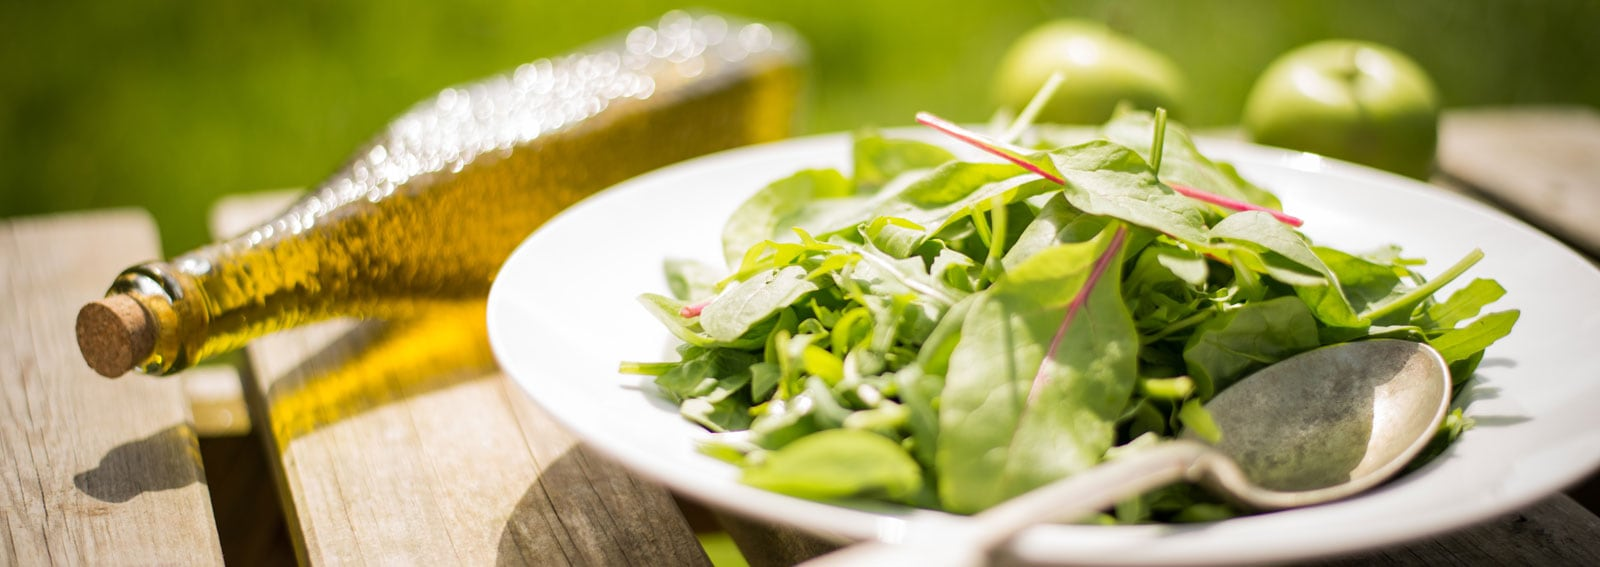 visore-dieta-magnesioDESK